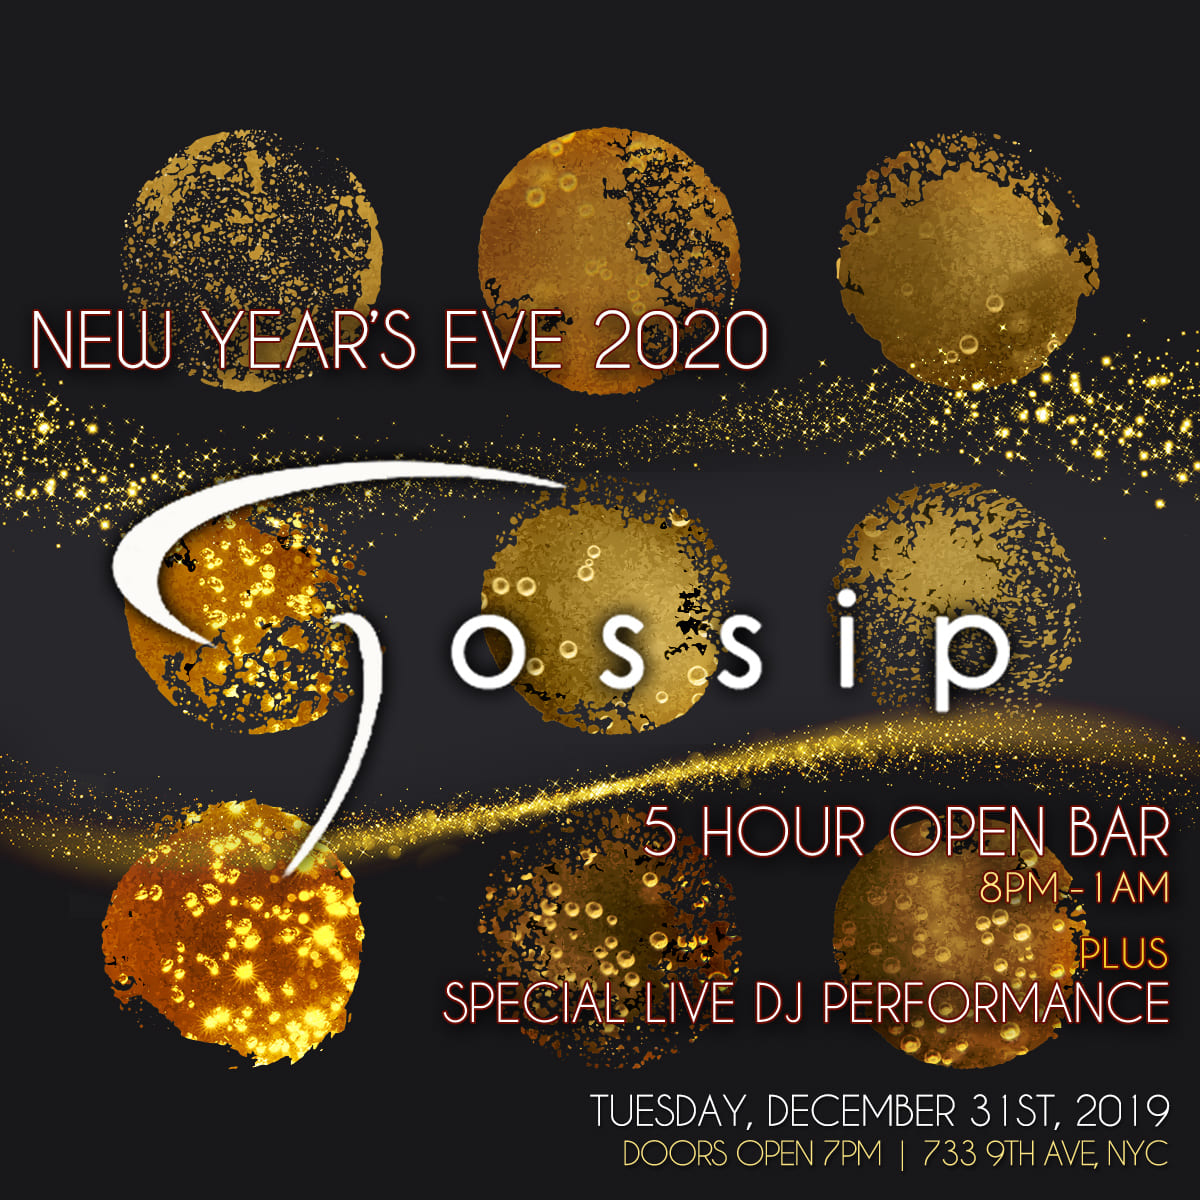 Gossip Bar NYE 2020